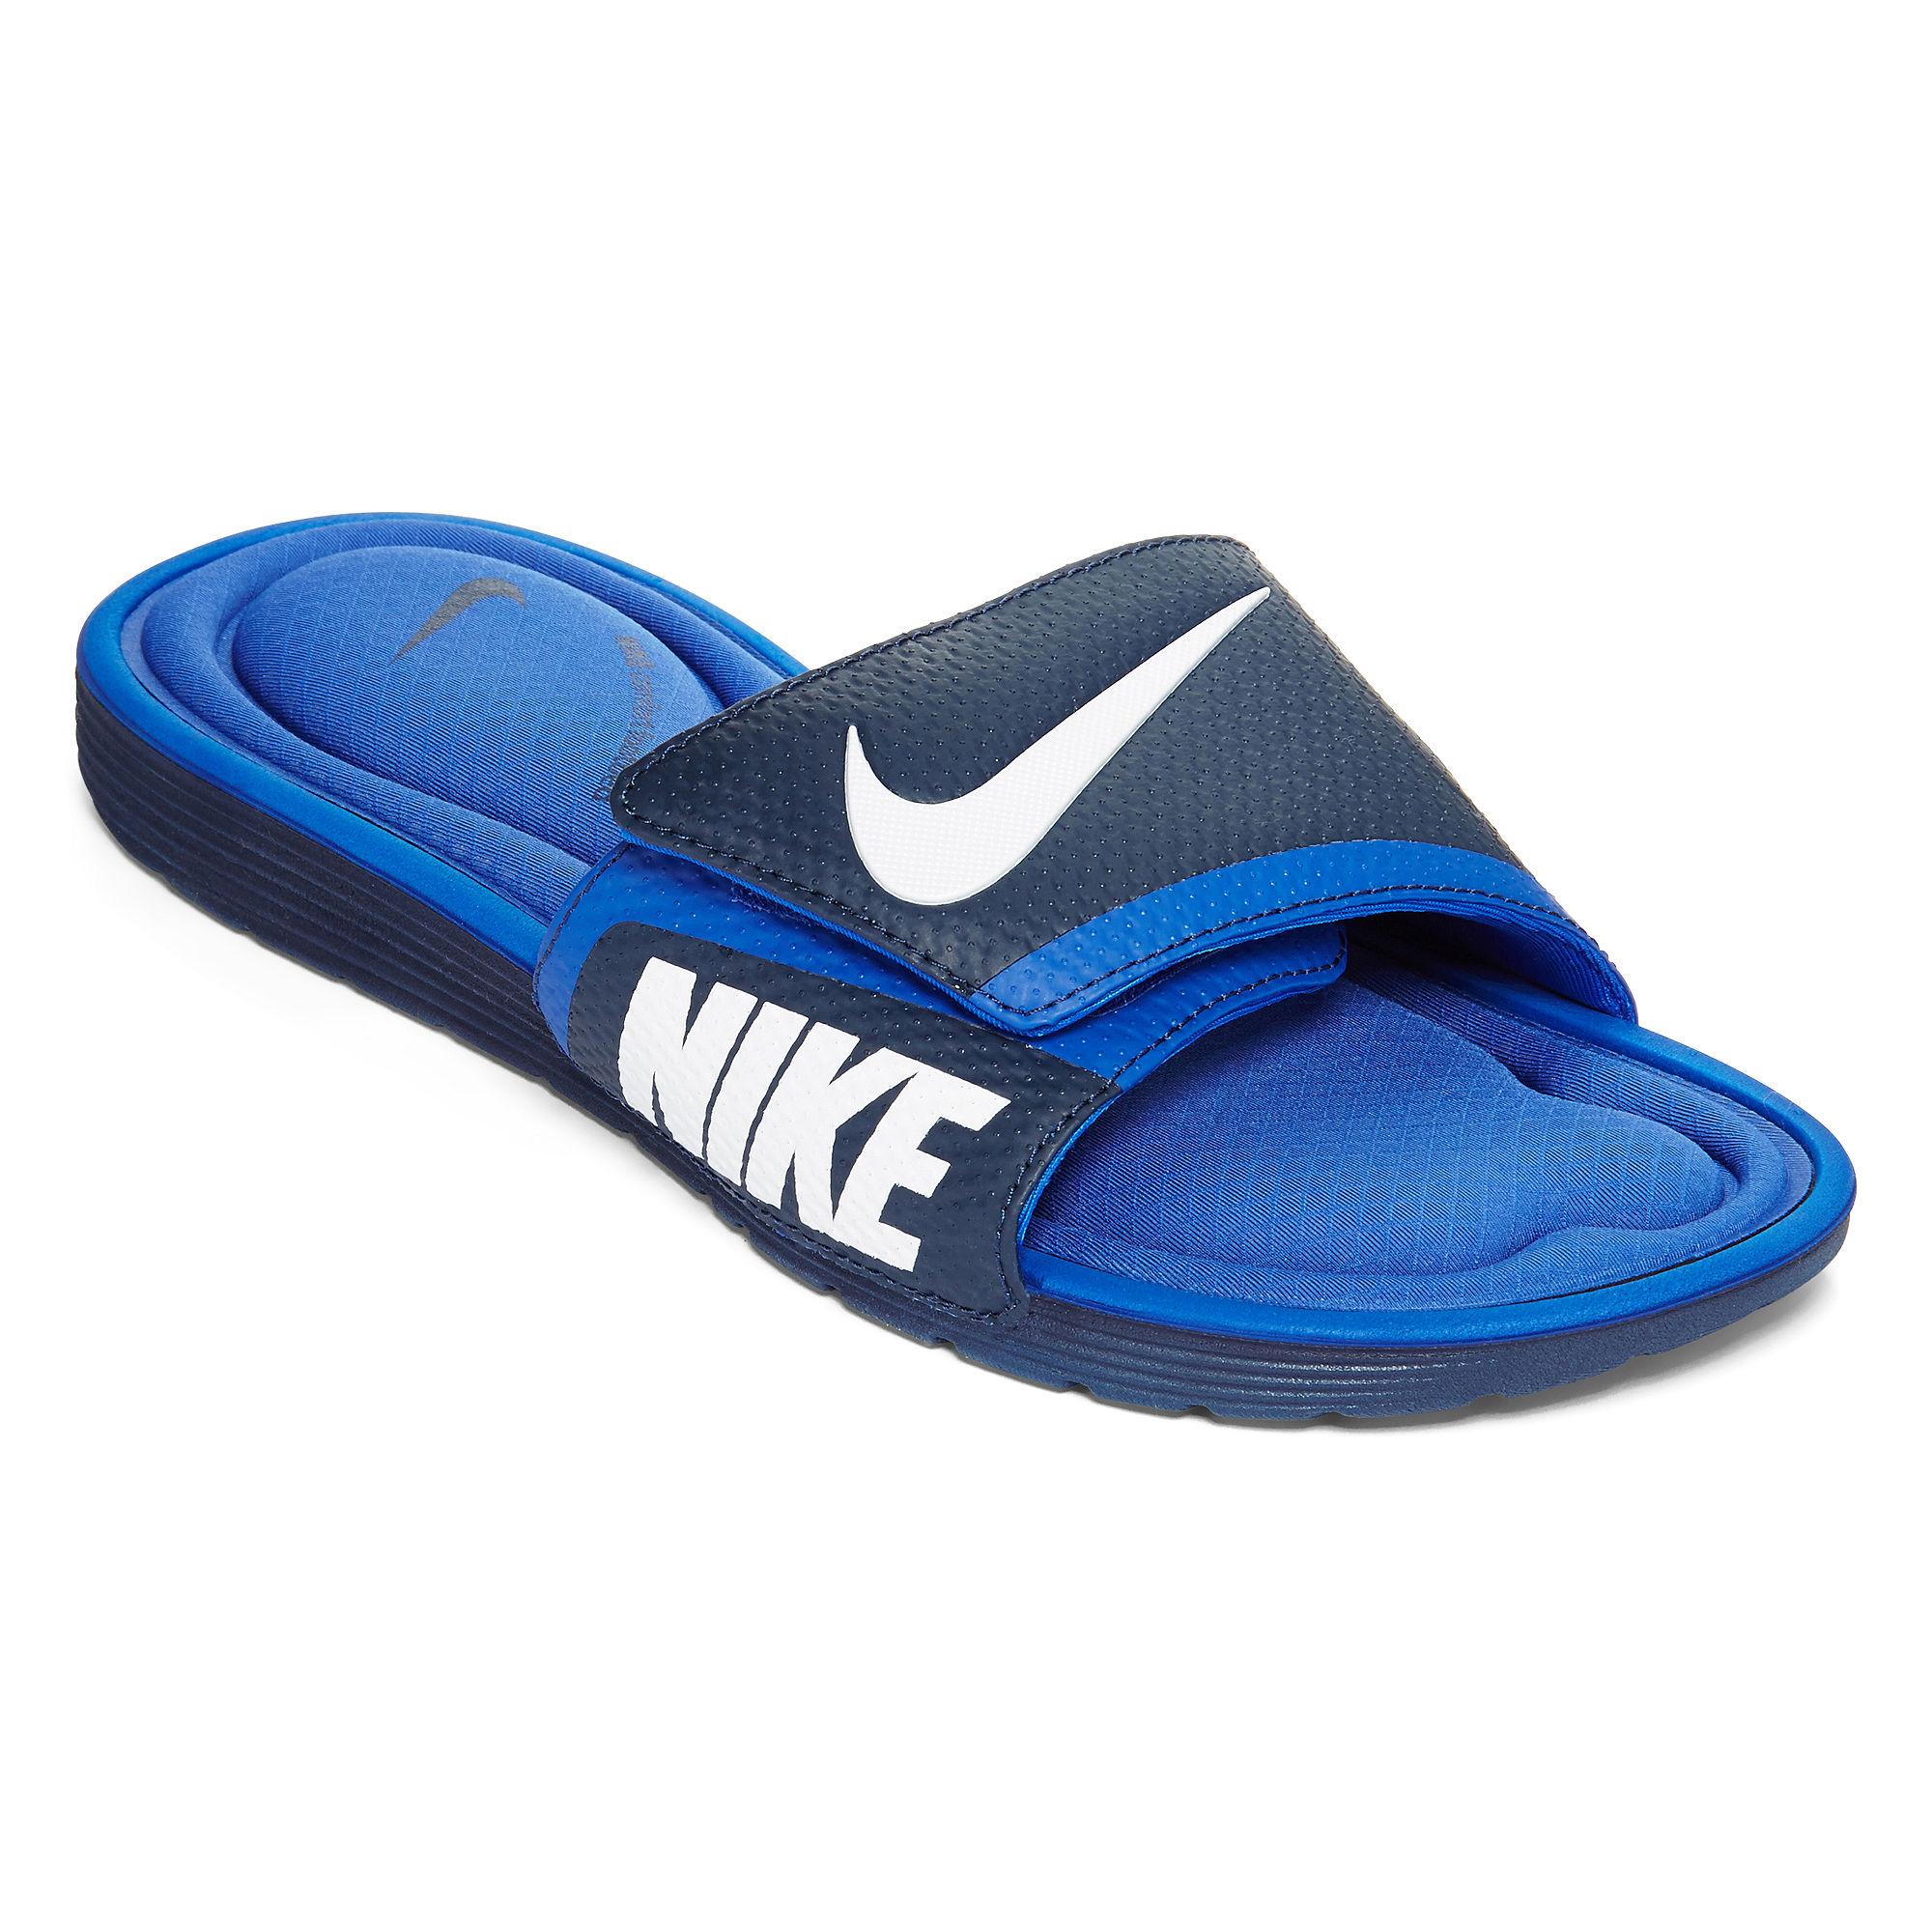 459a50c67 ... Sandal With Comfort Footbed Blue white UPC 888408315090 product image  for Nike Solarsoft Mens Comfort Slide Sandals